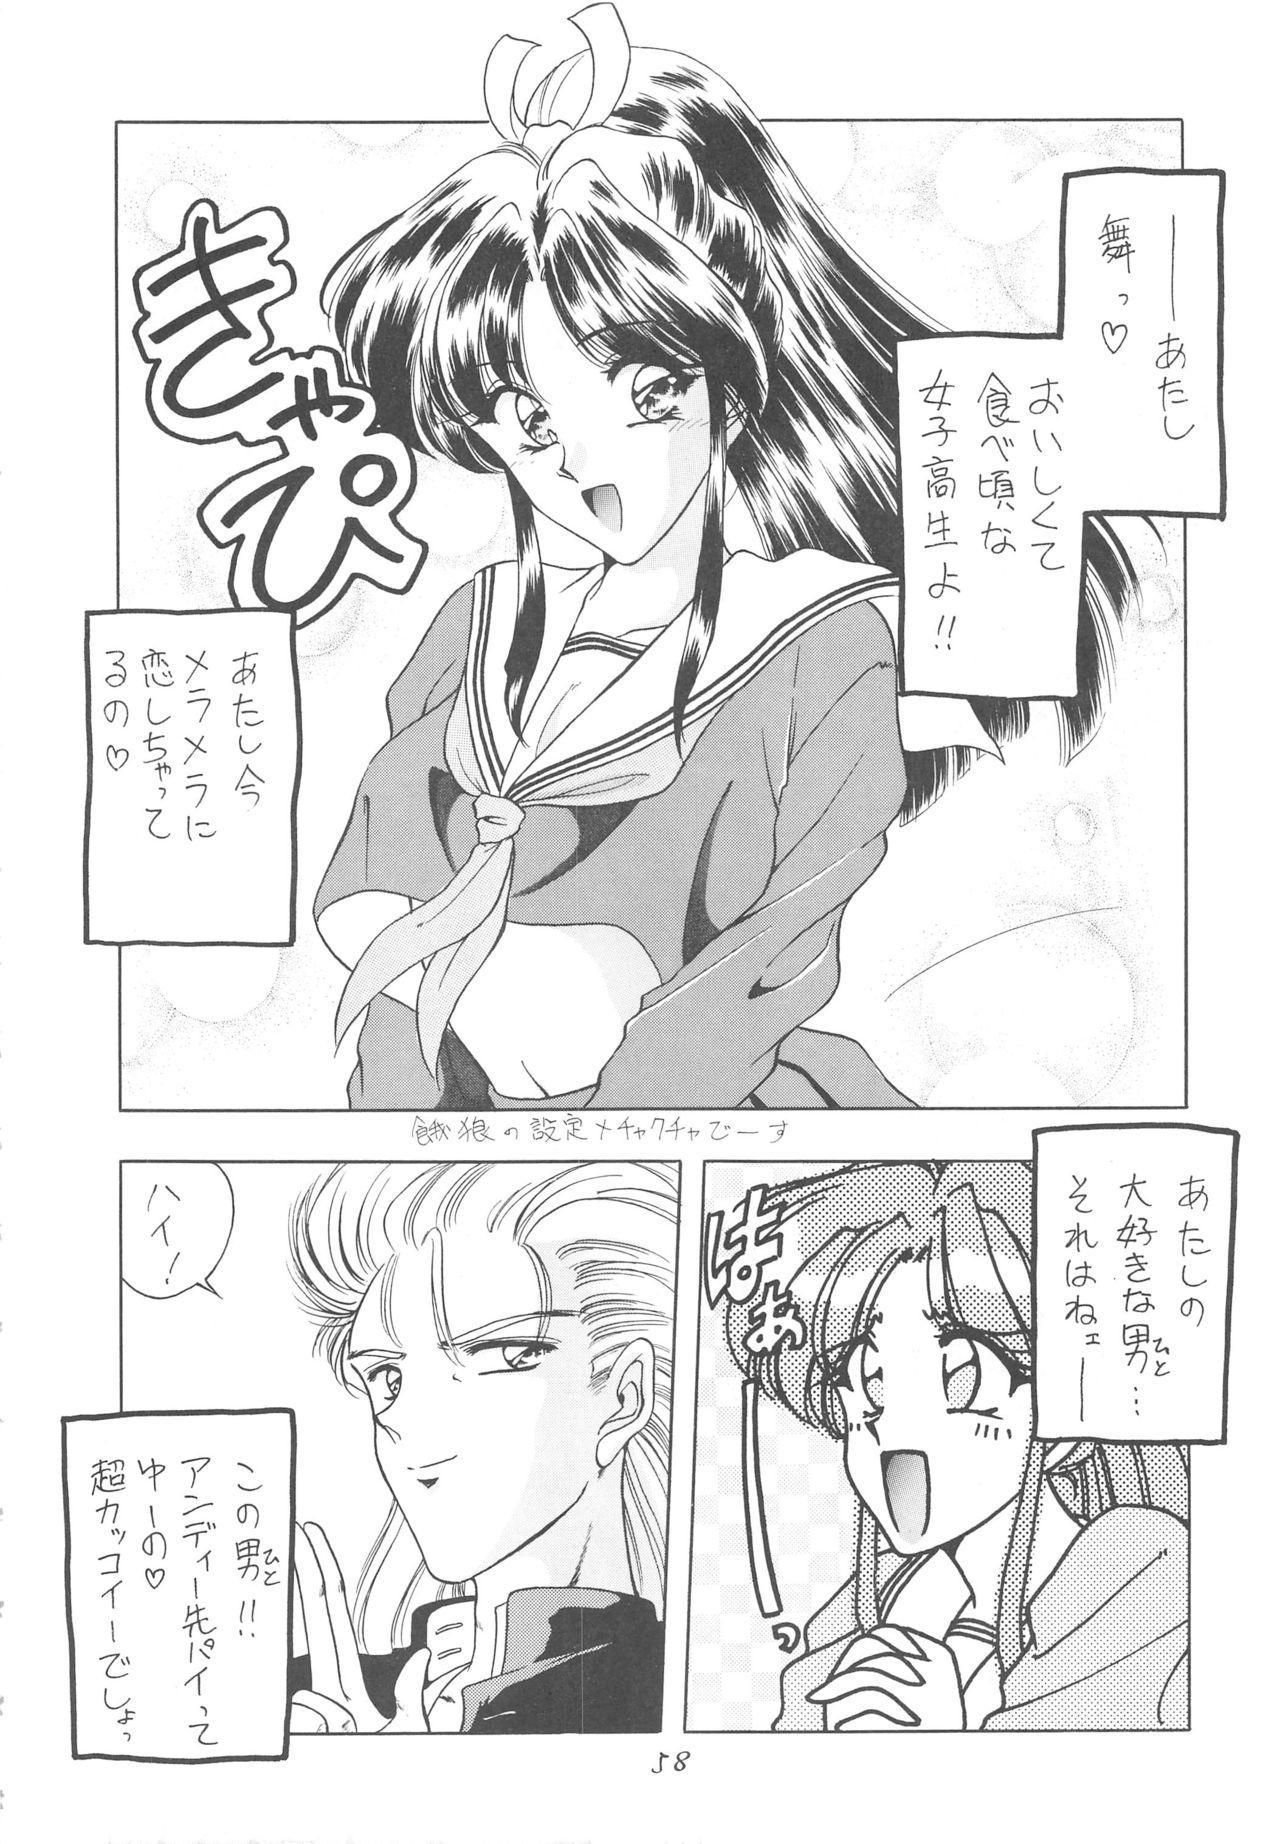 INDIVIDUAL 3 - 19930816 → 57